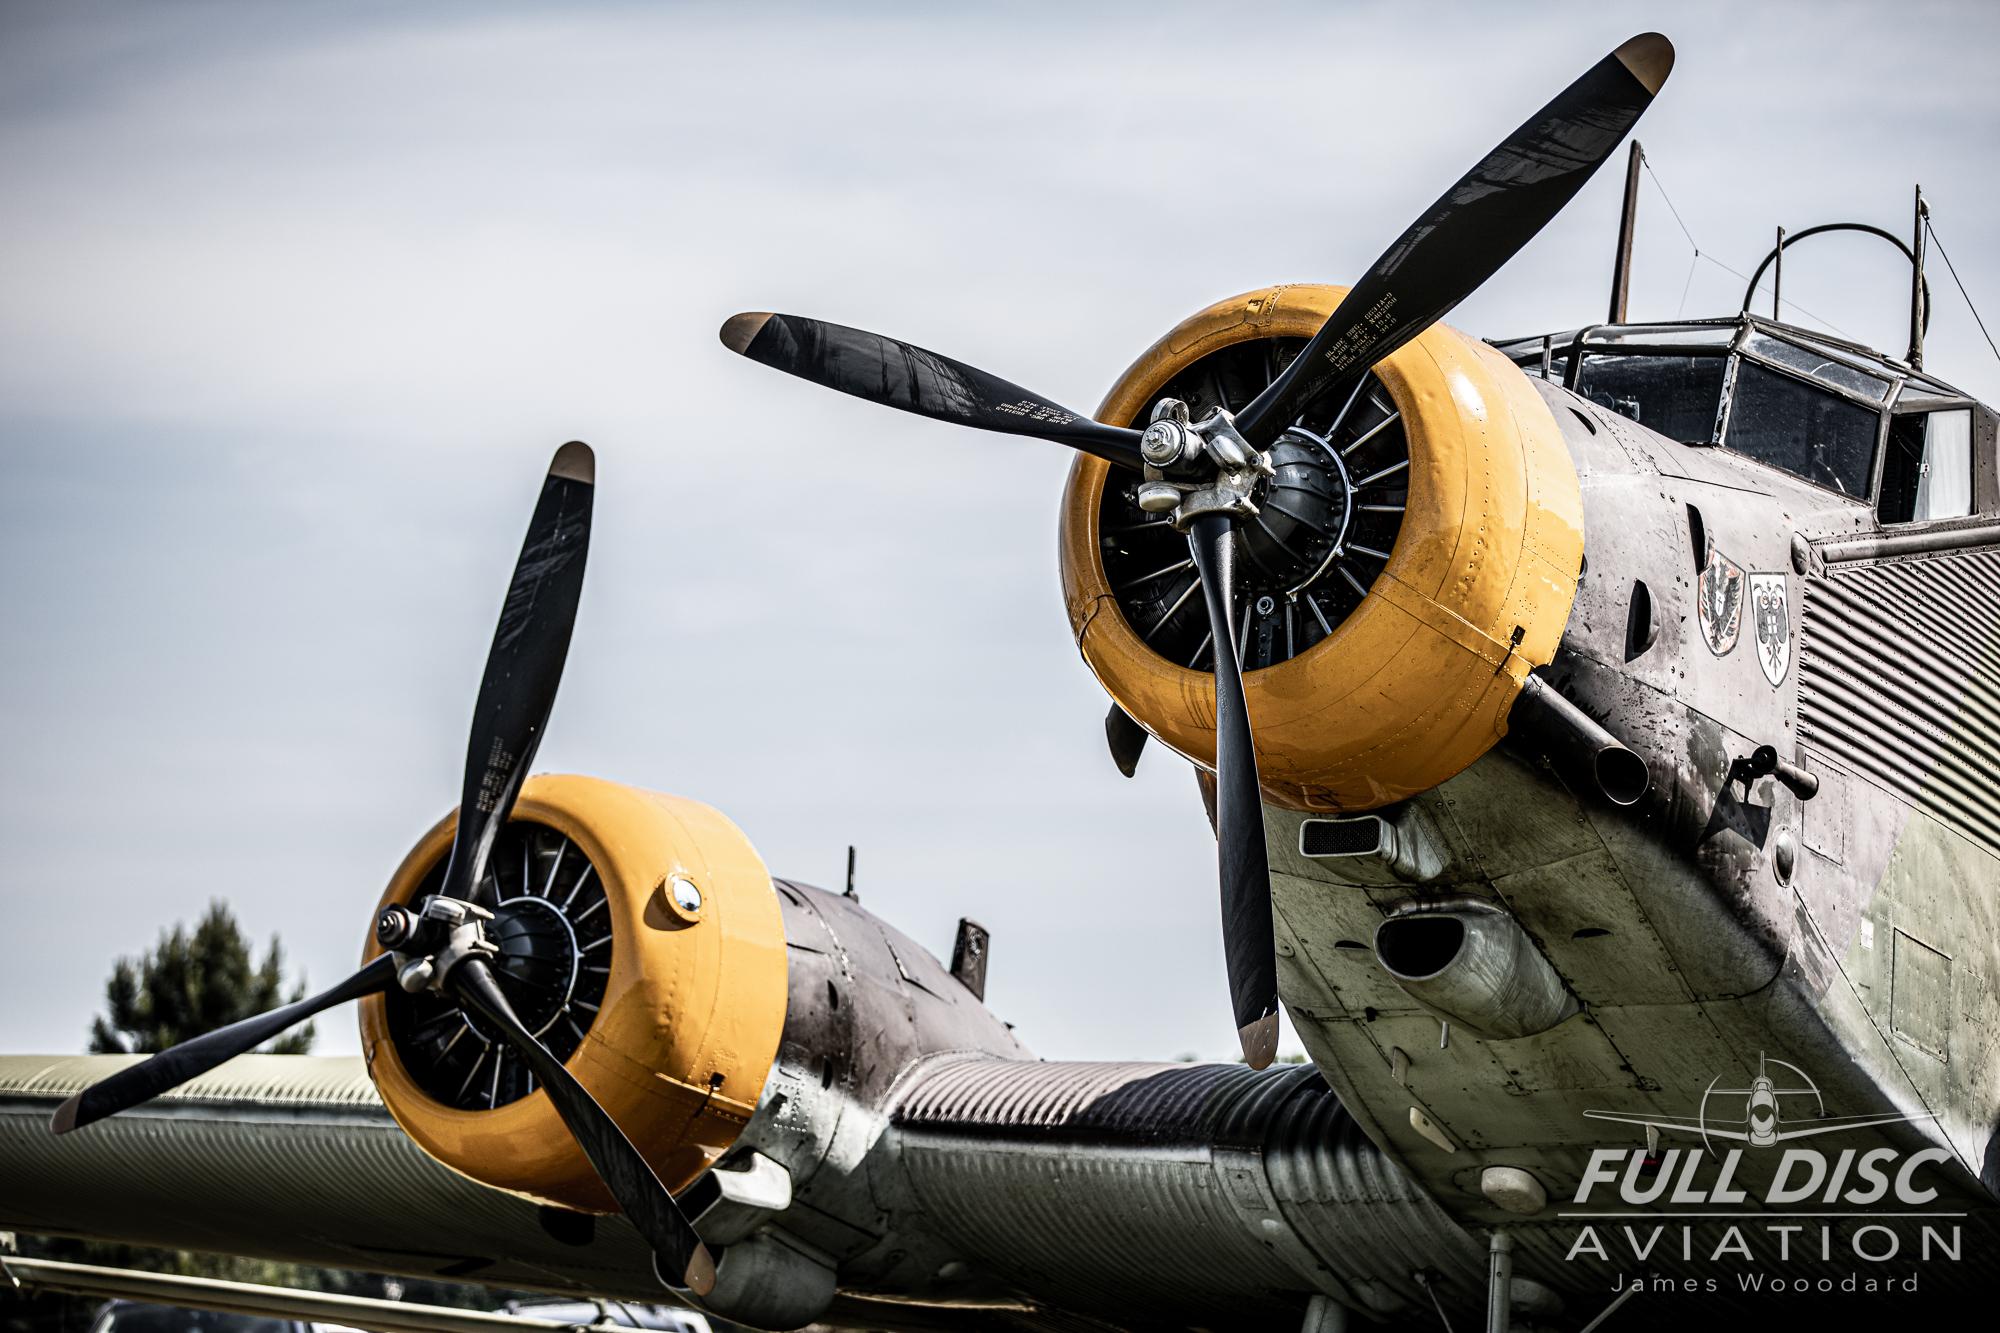 WarbirdsOverTheBeach_FullDiscAviation_JamesWoodard-May 18, 2019-44.jpg